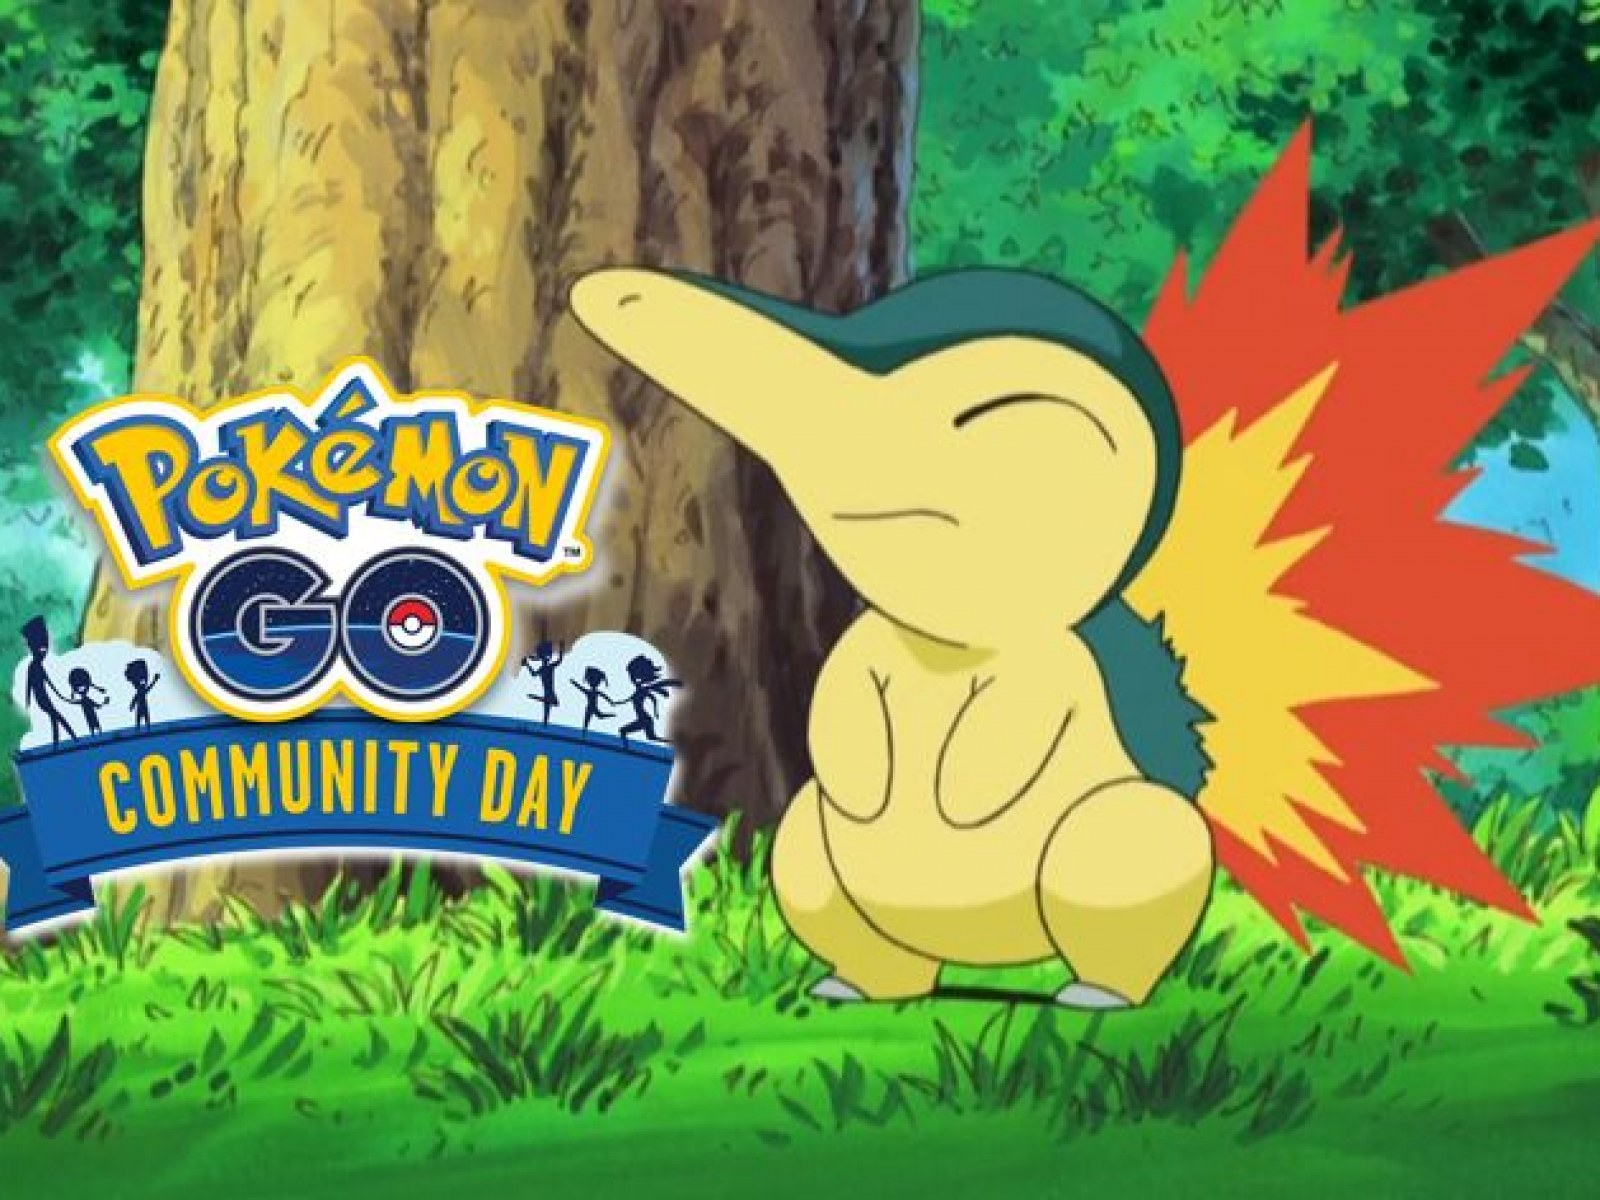 Pokémon Go' Community Day: Predicting the Next Set of Events